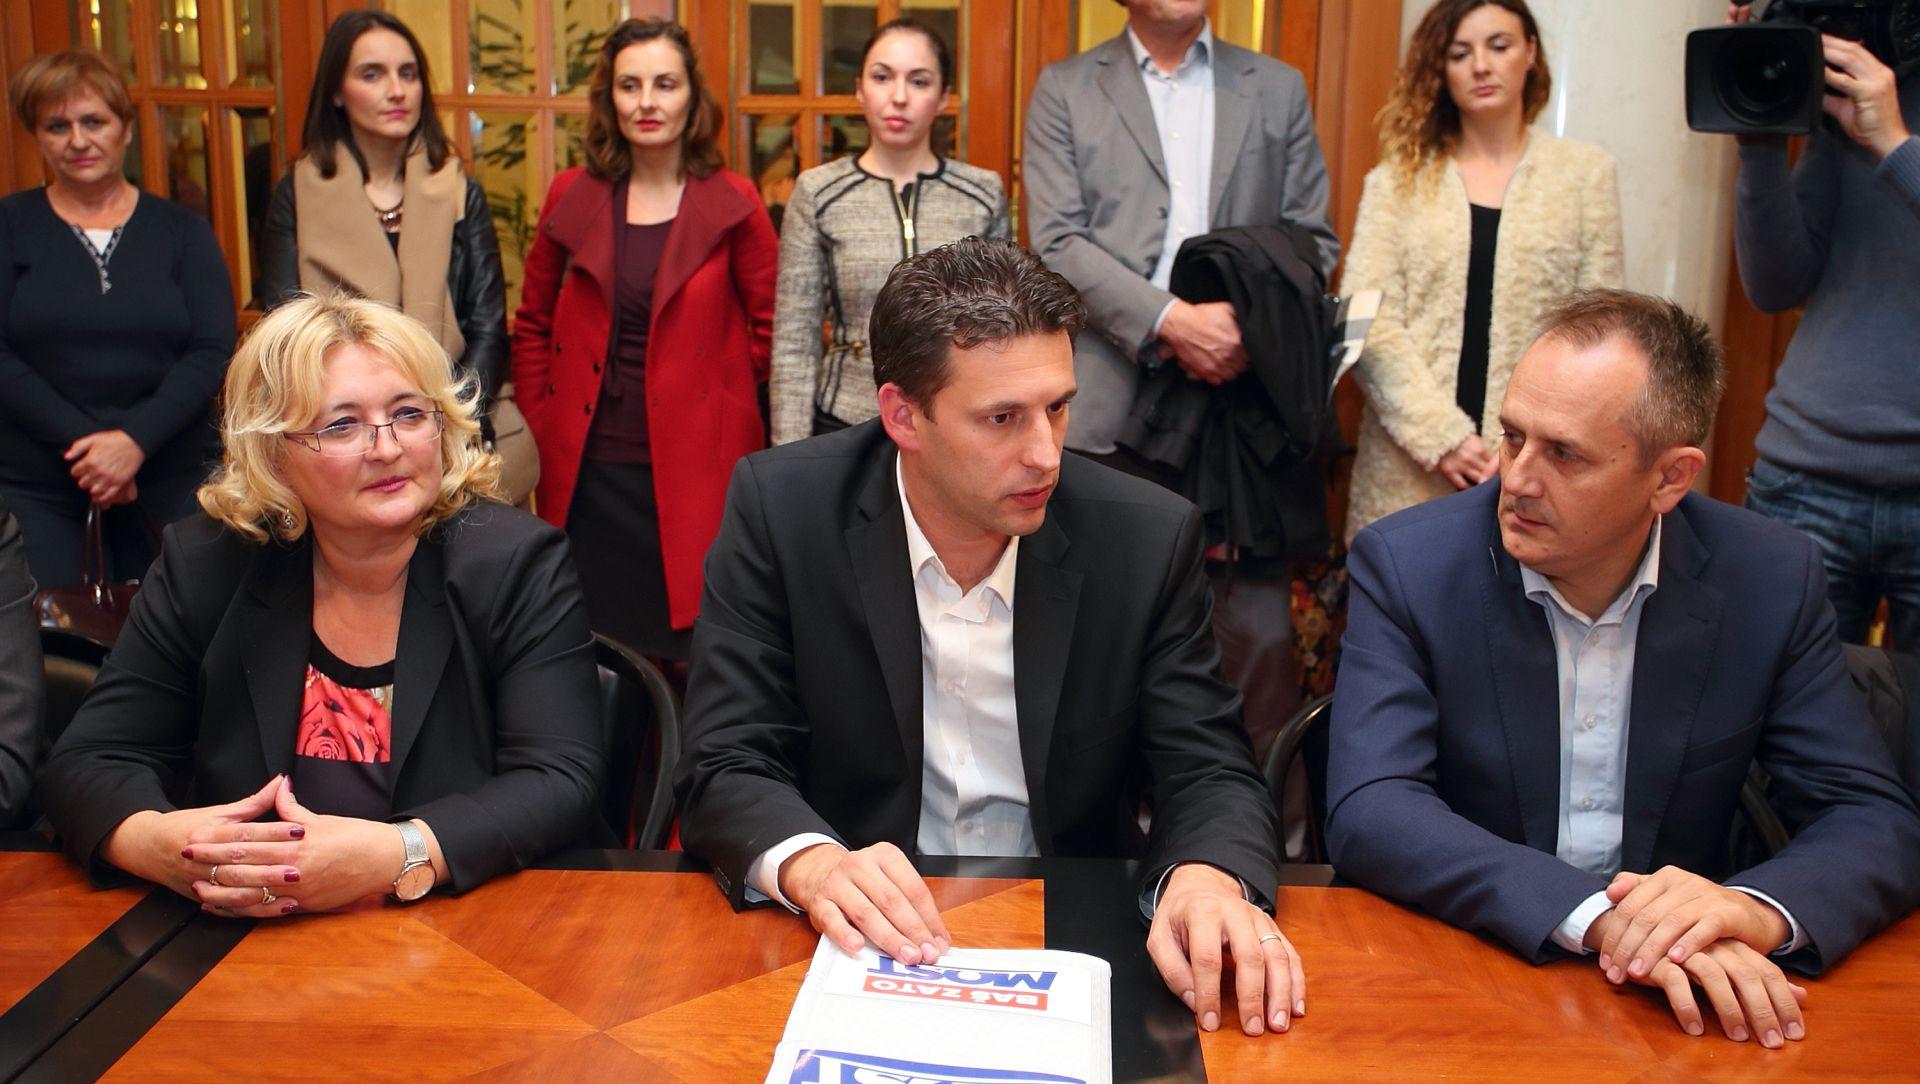 IZBORI 2015. Most predao izborne liste, Petrov uvjeren u deset mandata